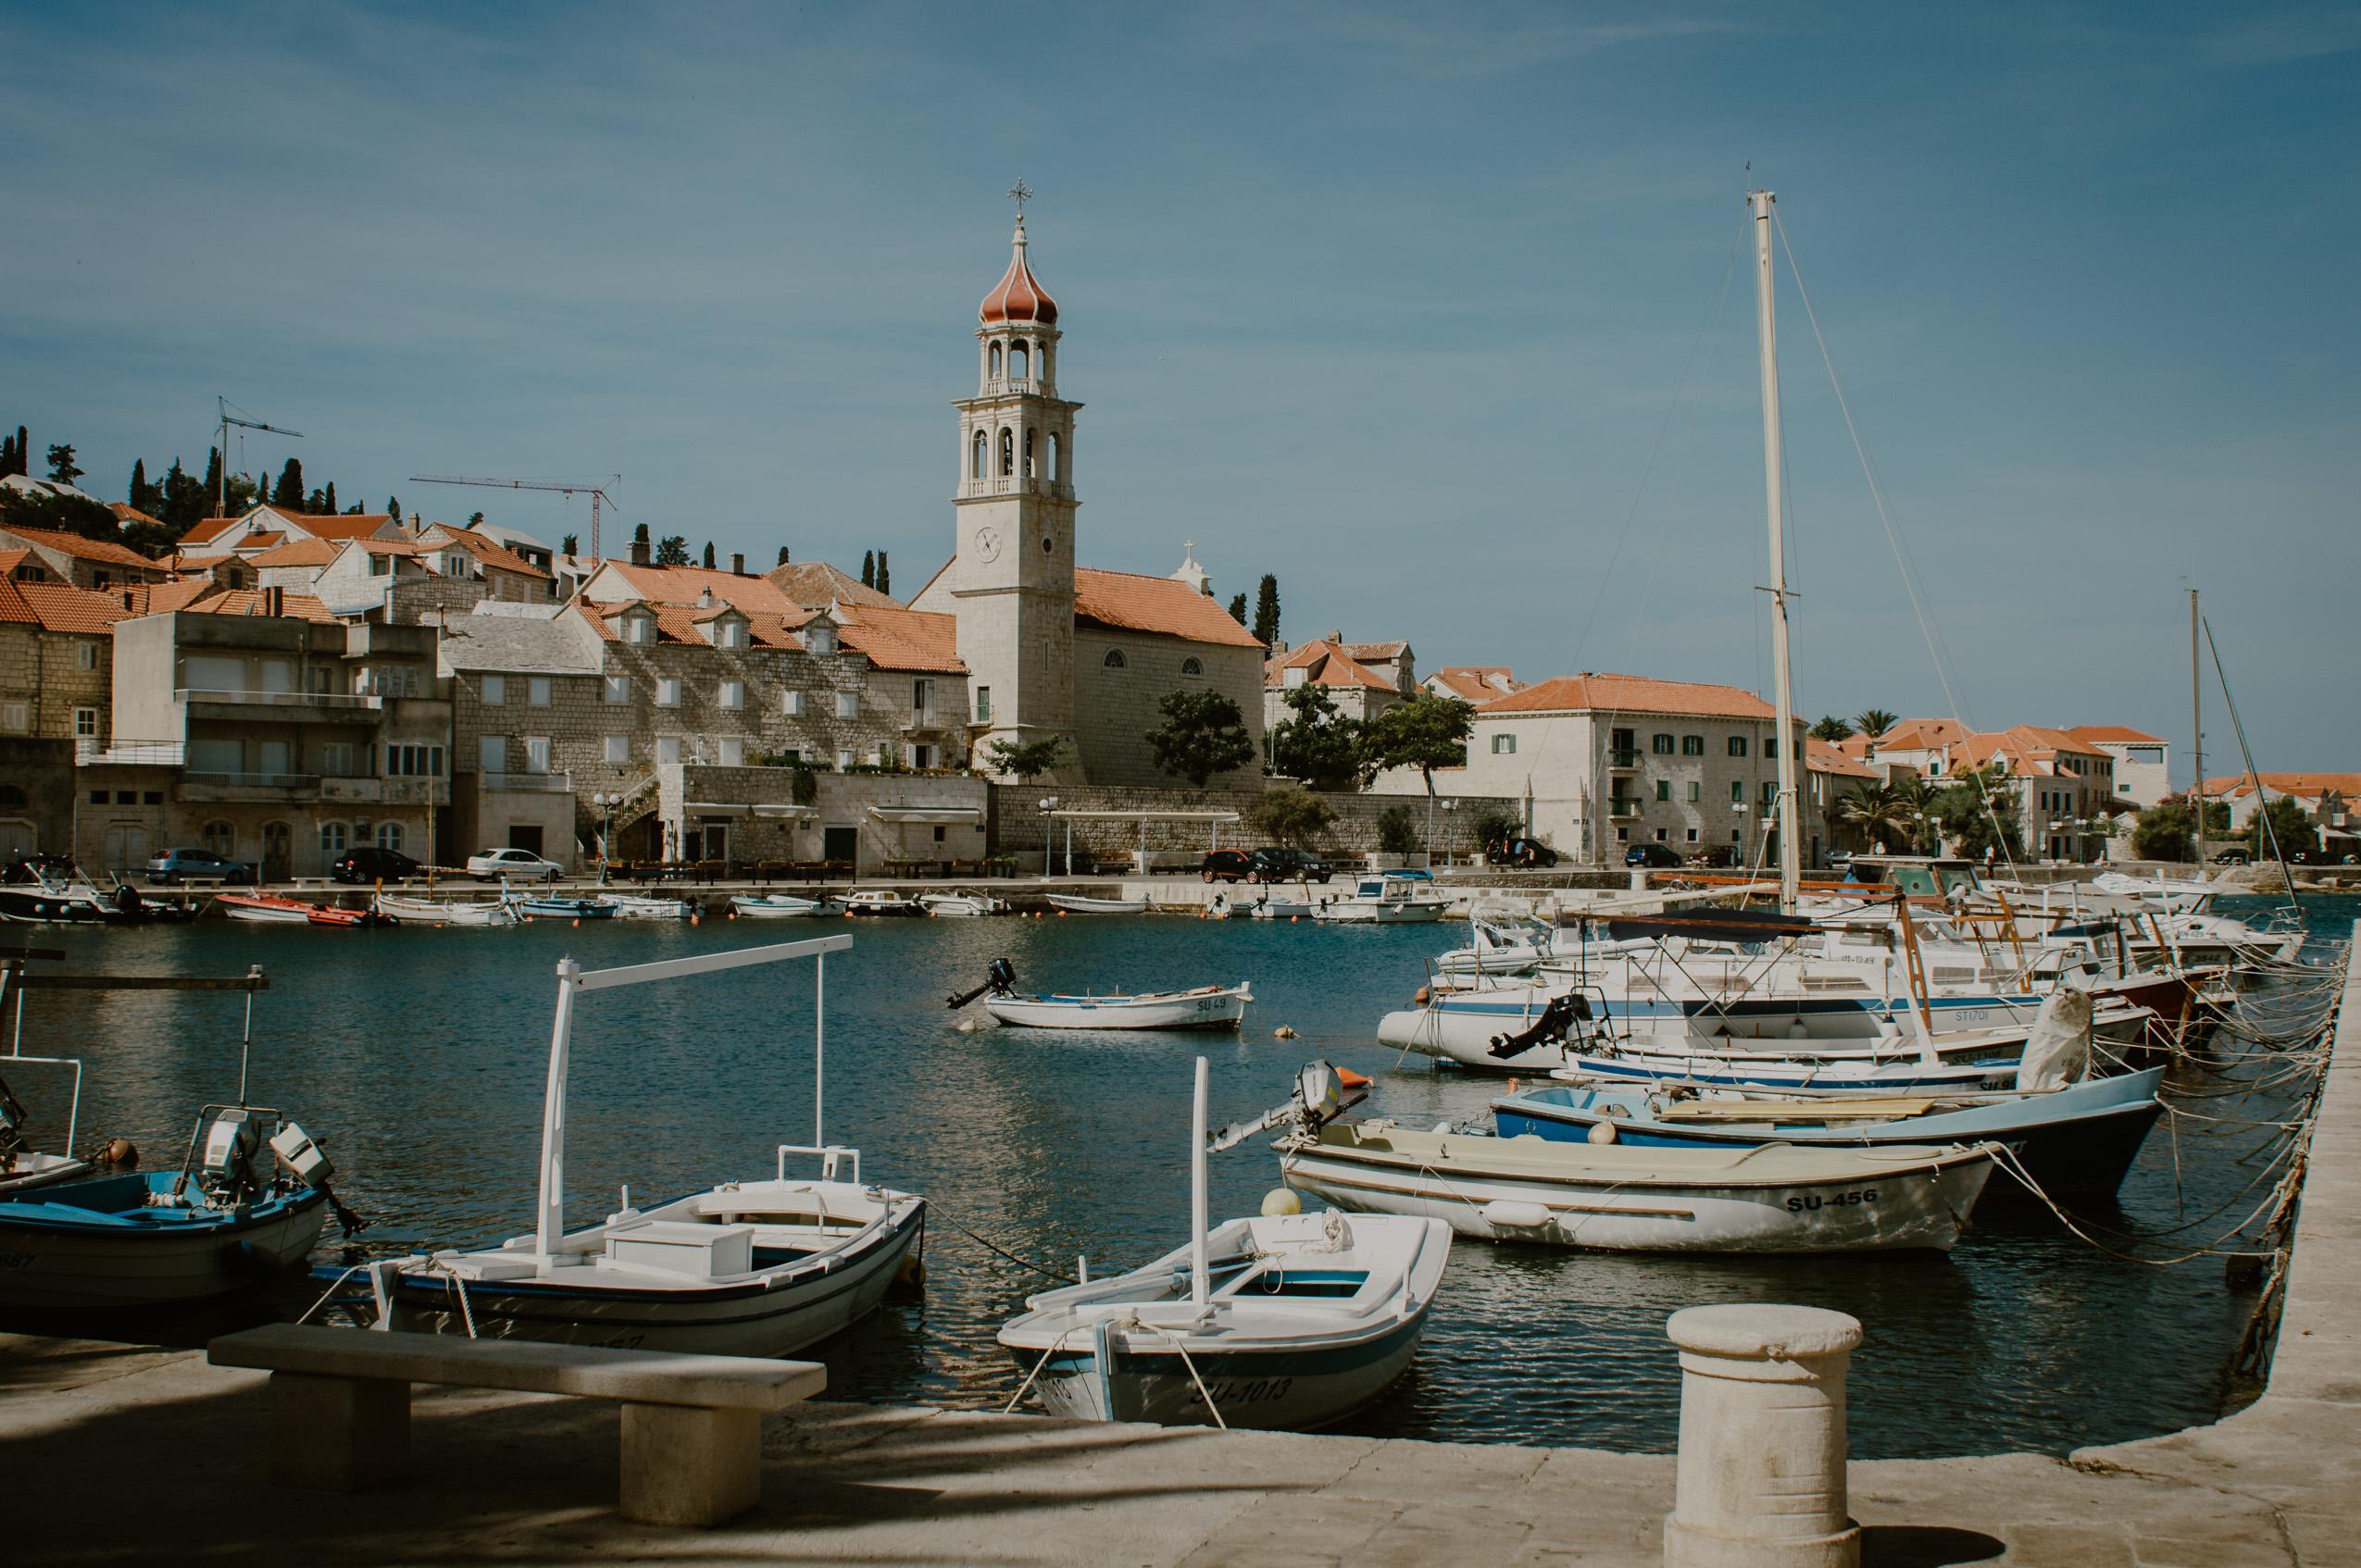 Chorwacja, wyspa Brač, dzień 3- Sutivan, Ložišća, Bobovišća na Moru